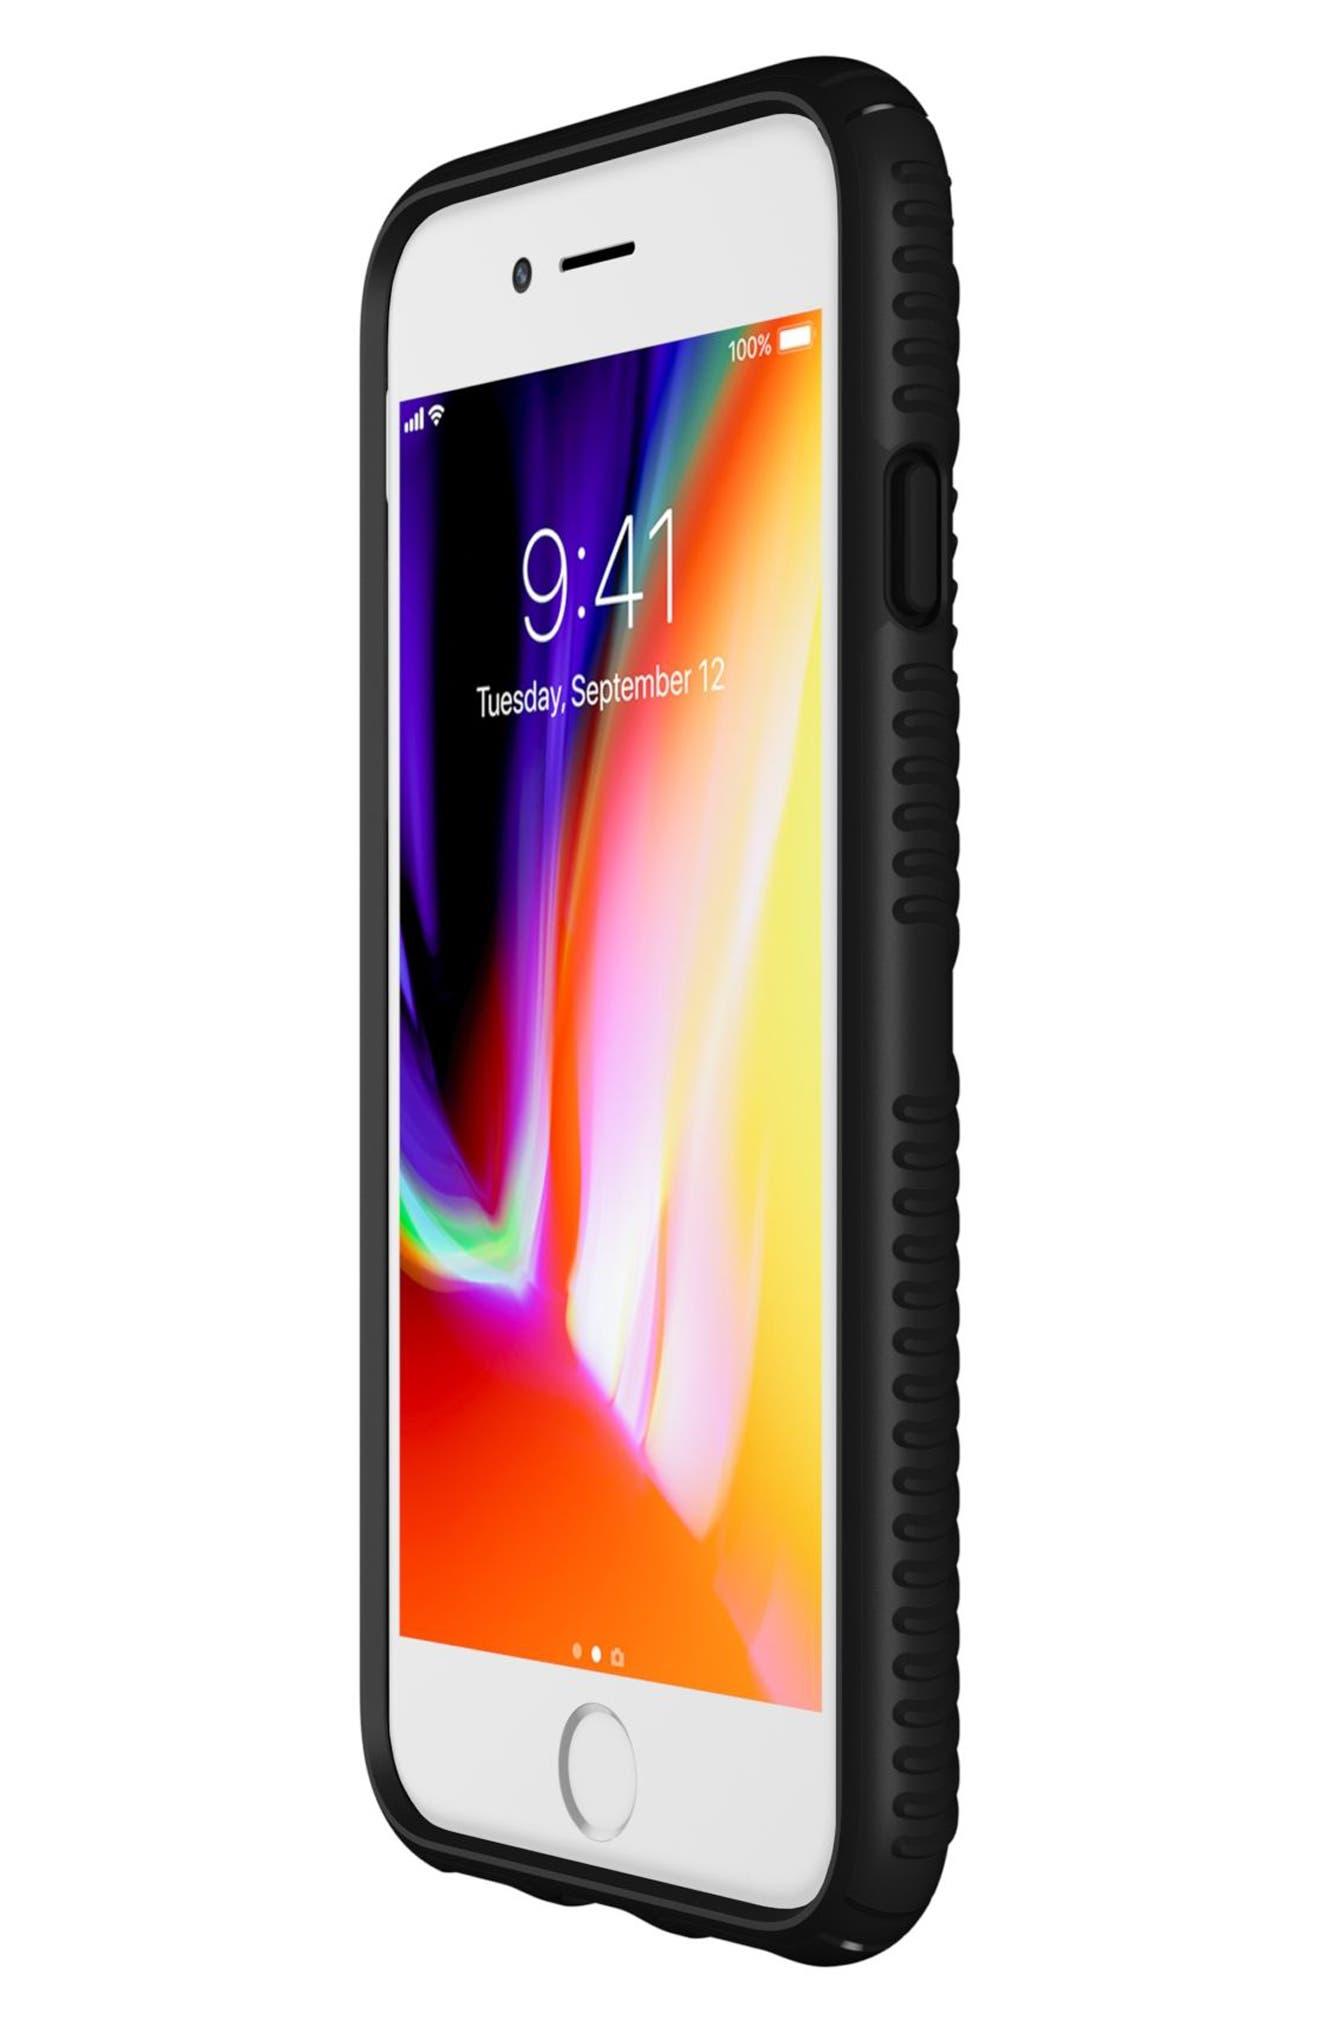 Grip iPhone 6/6s/7/8 Case,                             Alternate thumbnail 6, color,                             001